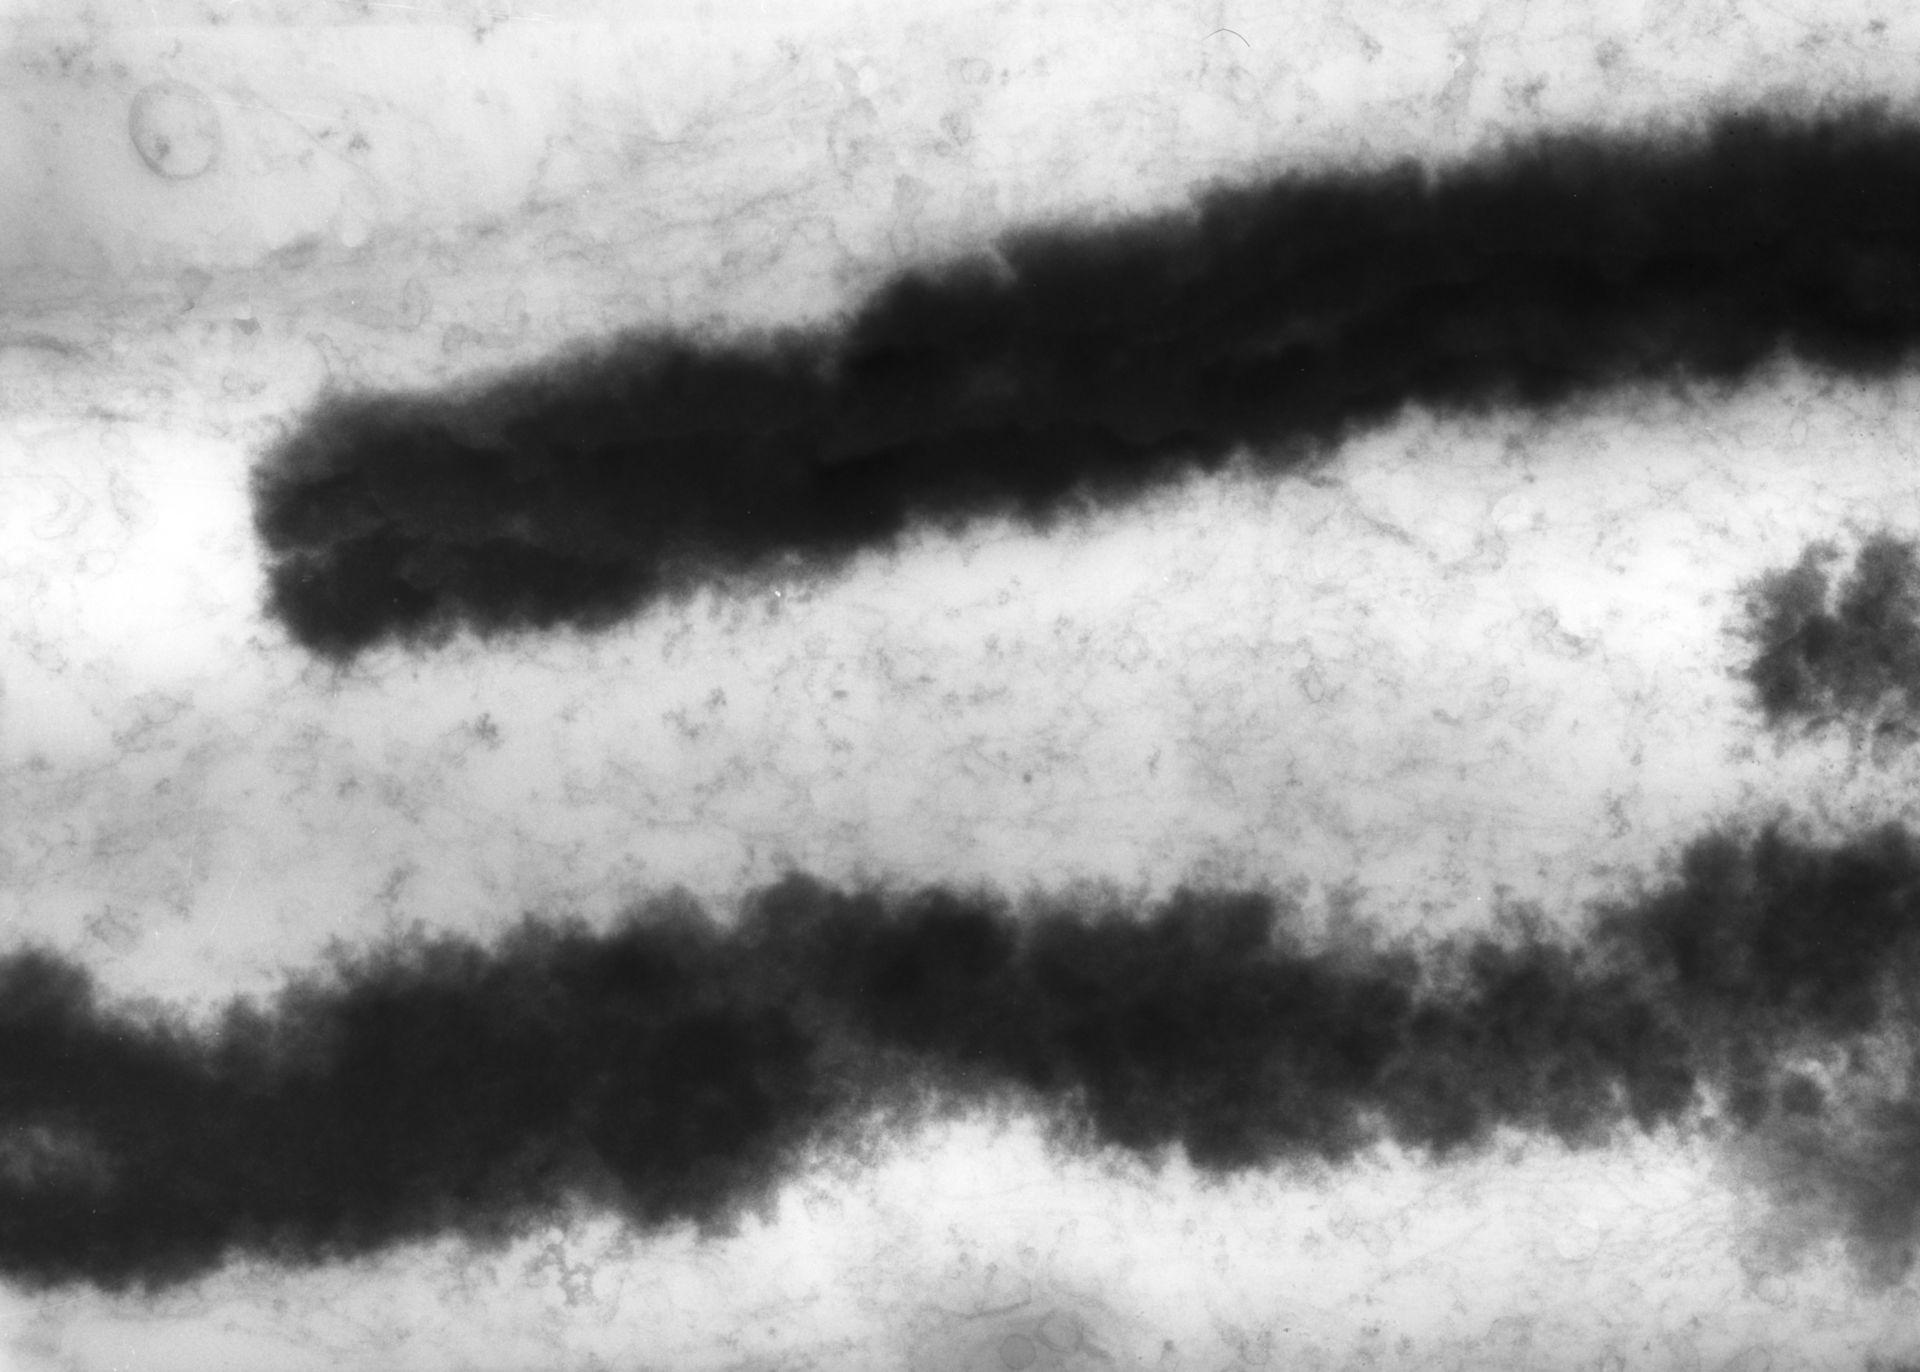 Haemanthus katharinae (Nuclear chromosome) - CIL:11912